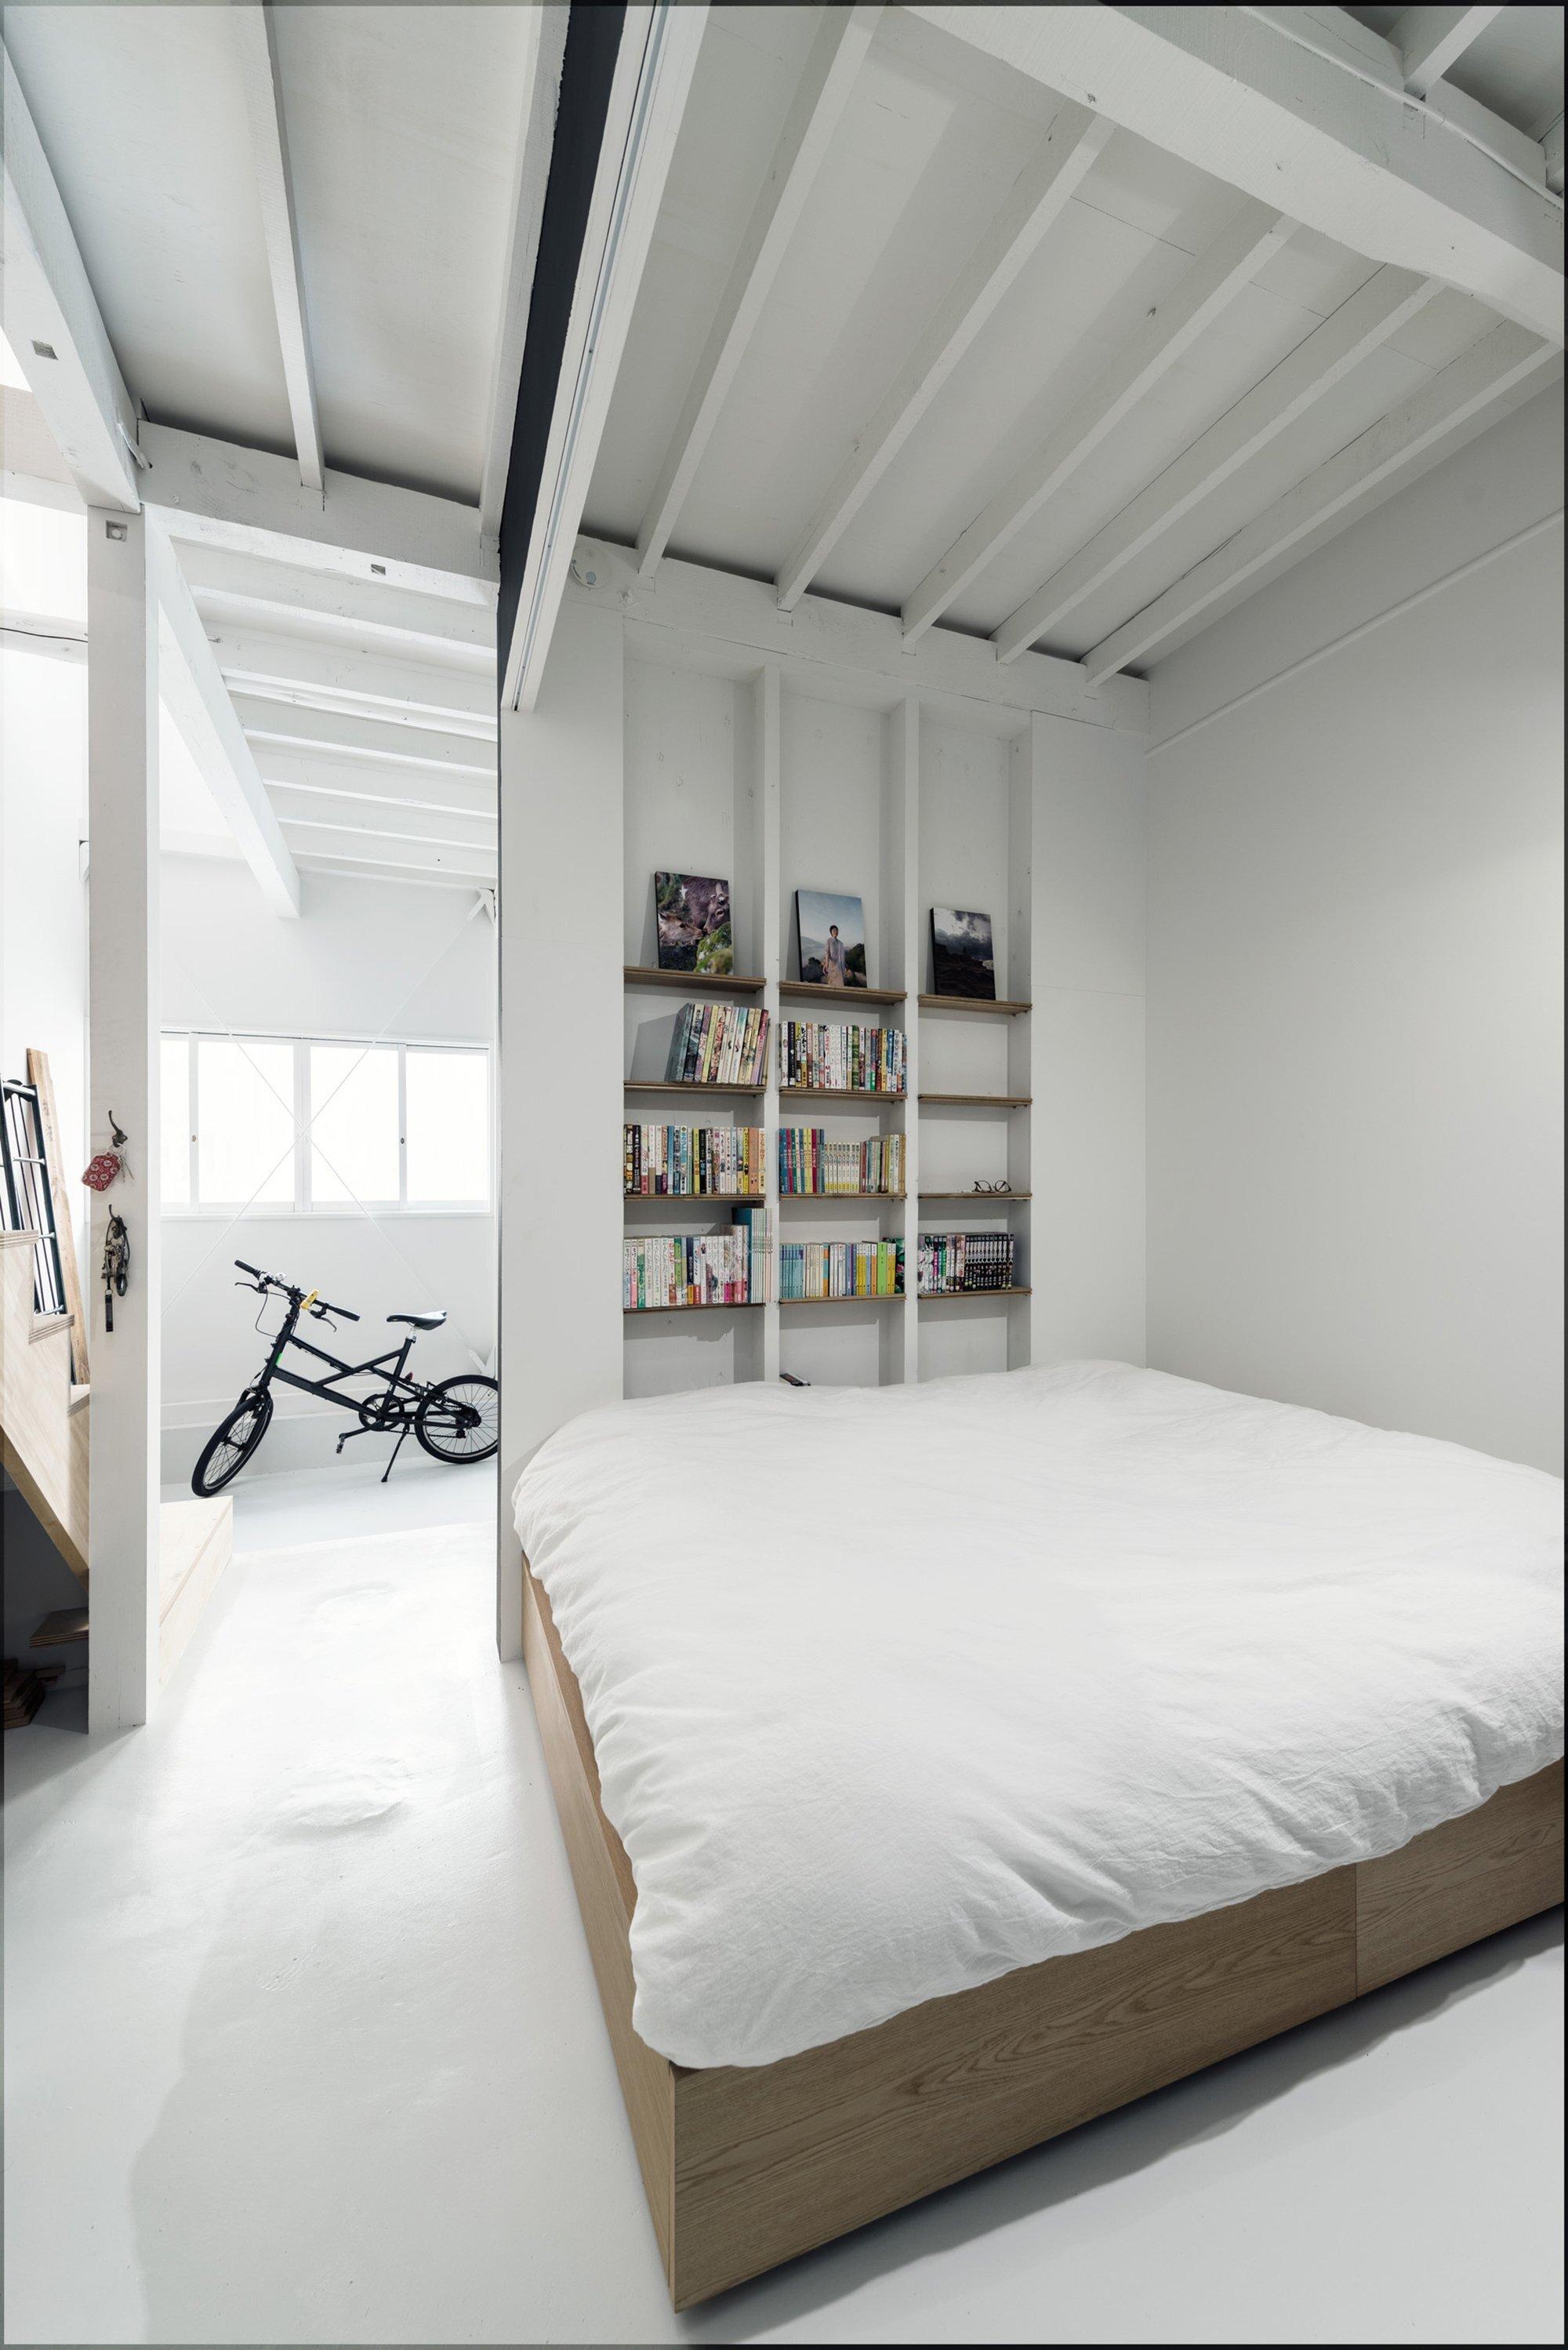 Re-Toyosaki - Small Japanese House - Coil Kazuteru Matumura Architects - Osaka Japan - Bedroom - Humble Homes